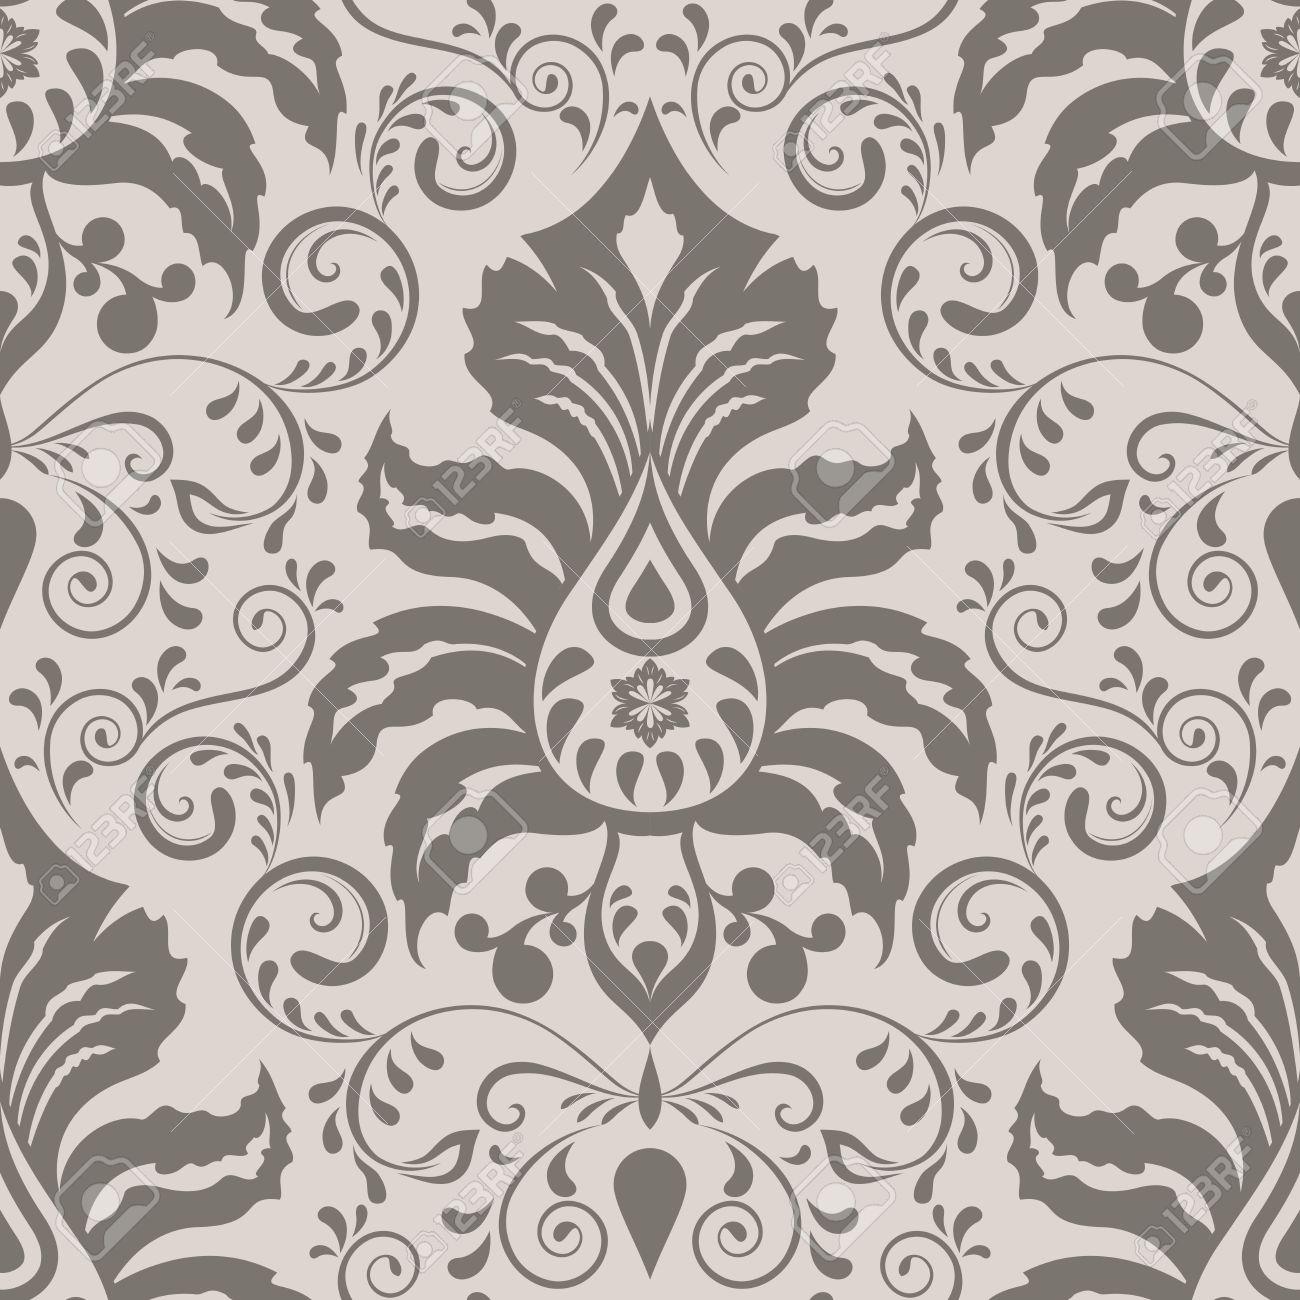 Charmant Papier Peint Fleuri Vintage #15: Etonnant Papier Peint Fleuri Vintage #1: Papiers Peints Vintage